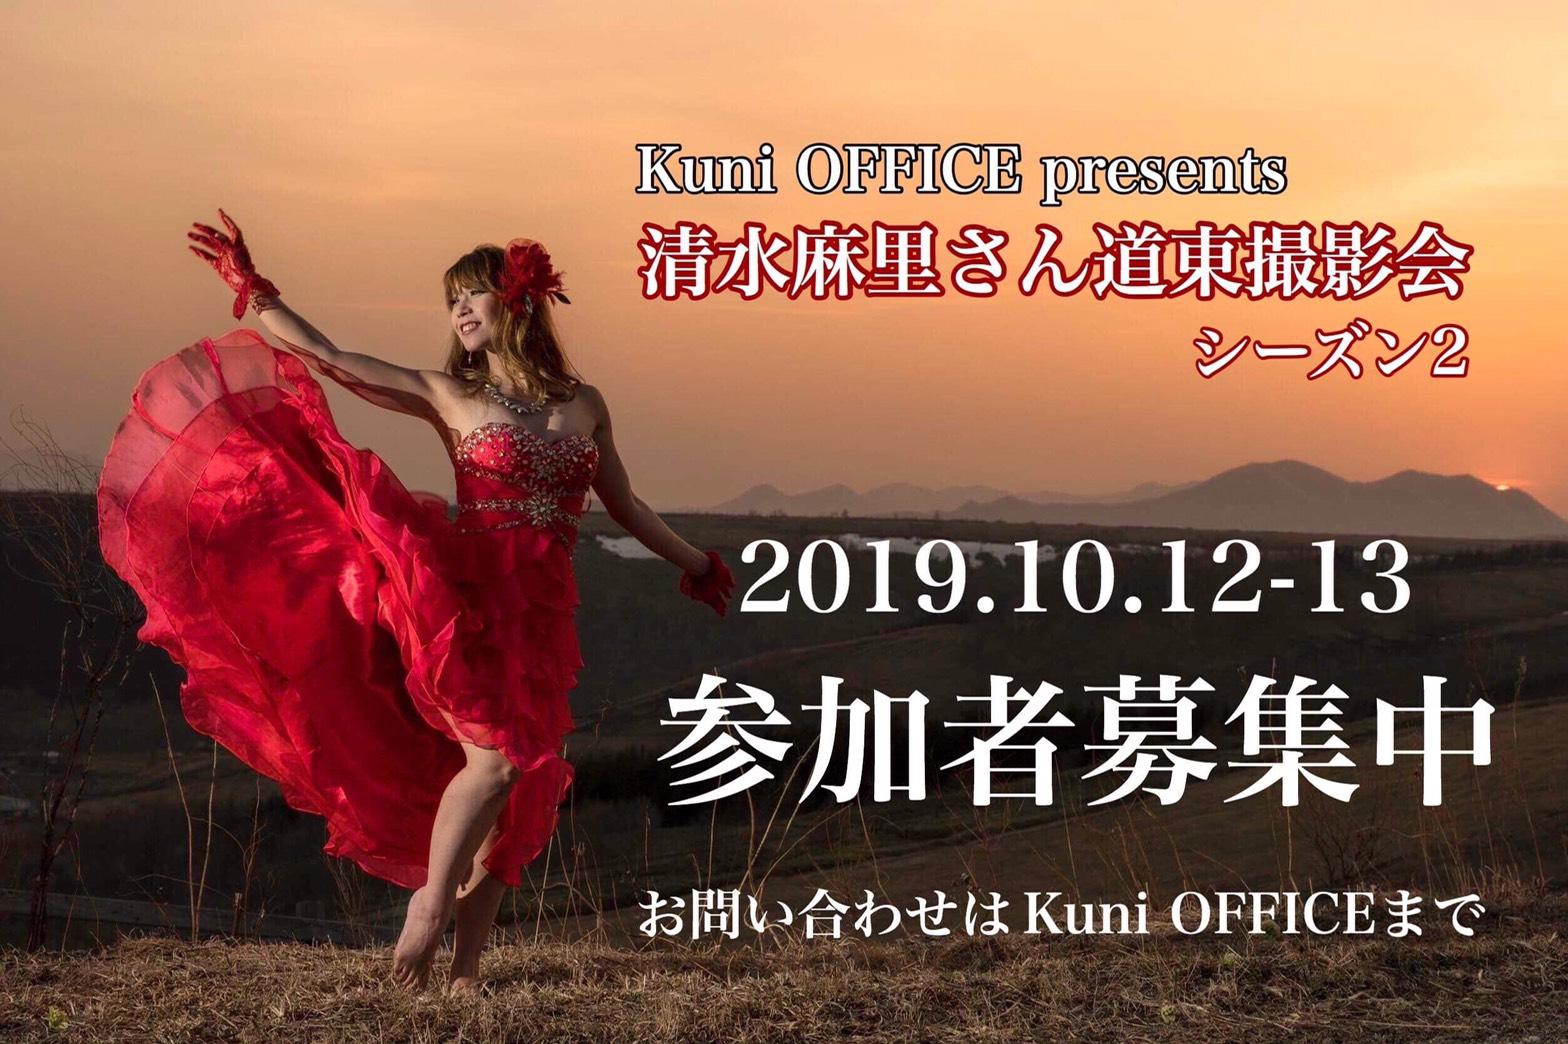 Kuni Office presents 清水麻里さん道東撮影会